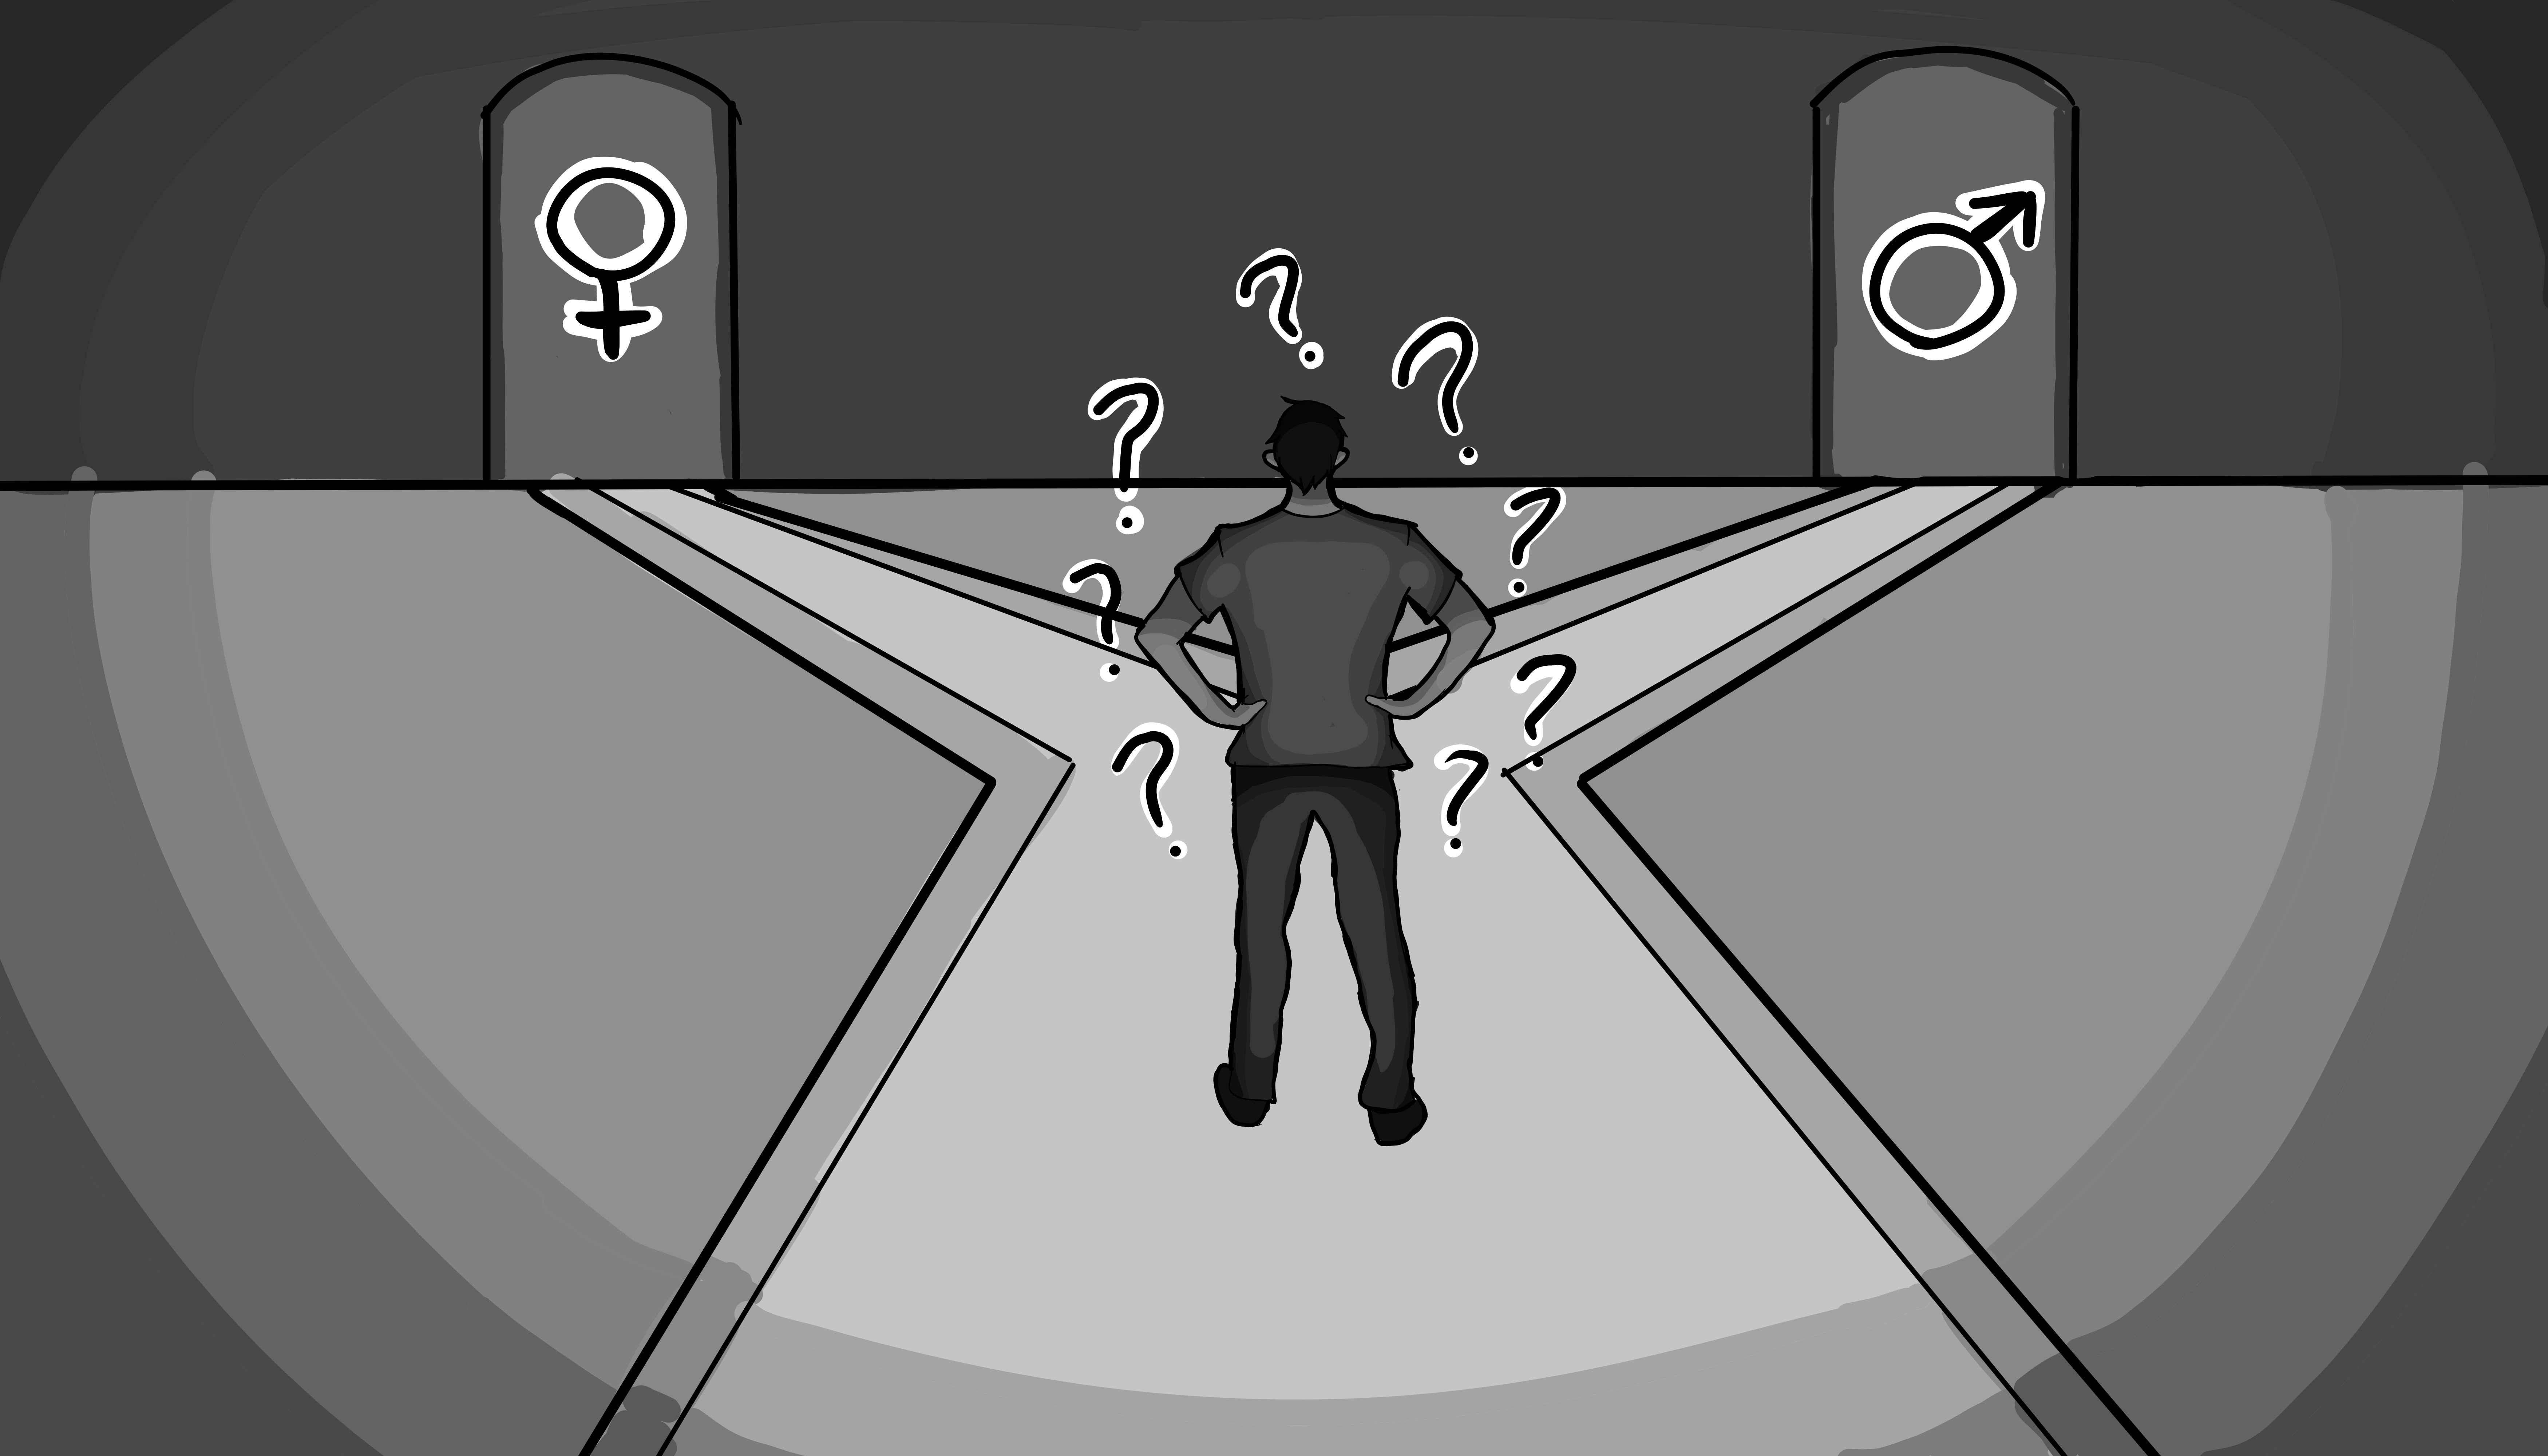 Issue 8 - McCormick - Trans Bathrooms - Final Draft.jpg